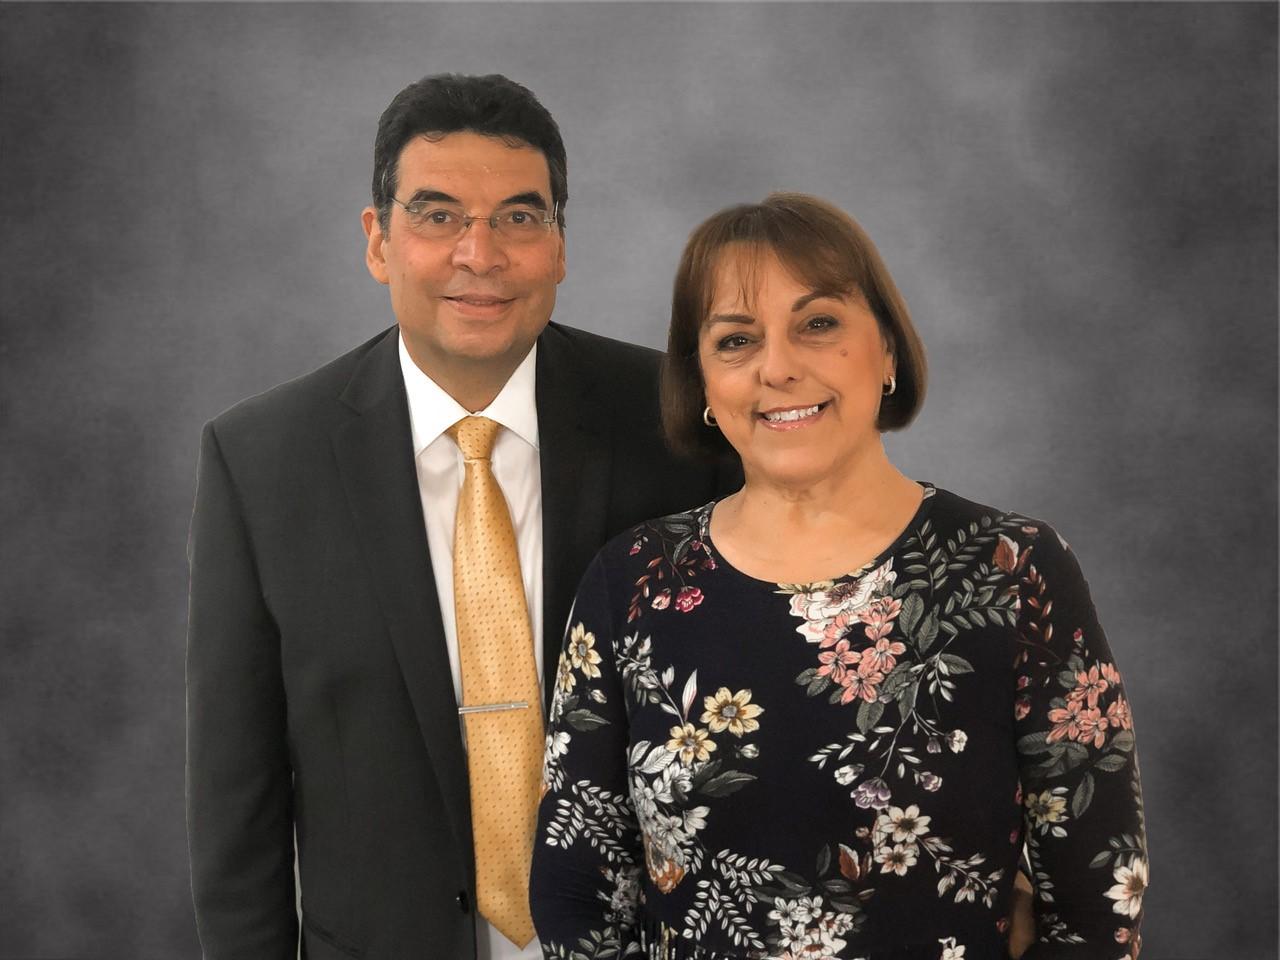 Getulio W. and Cintia N. Silva